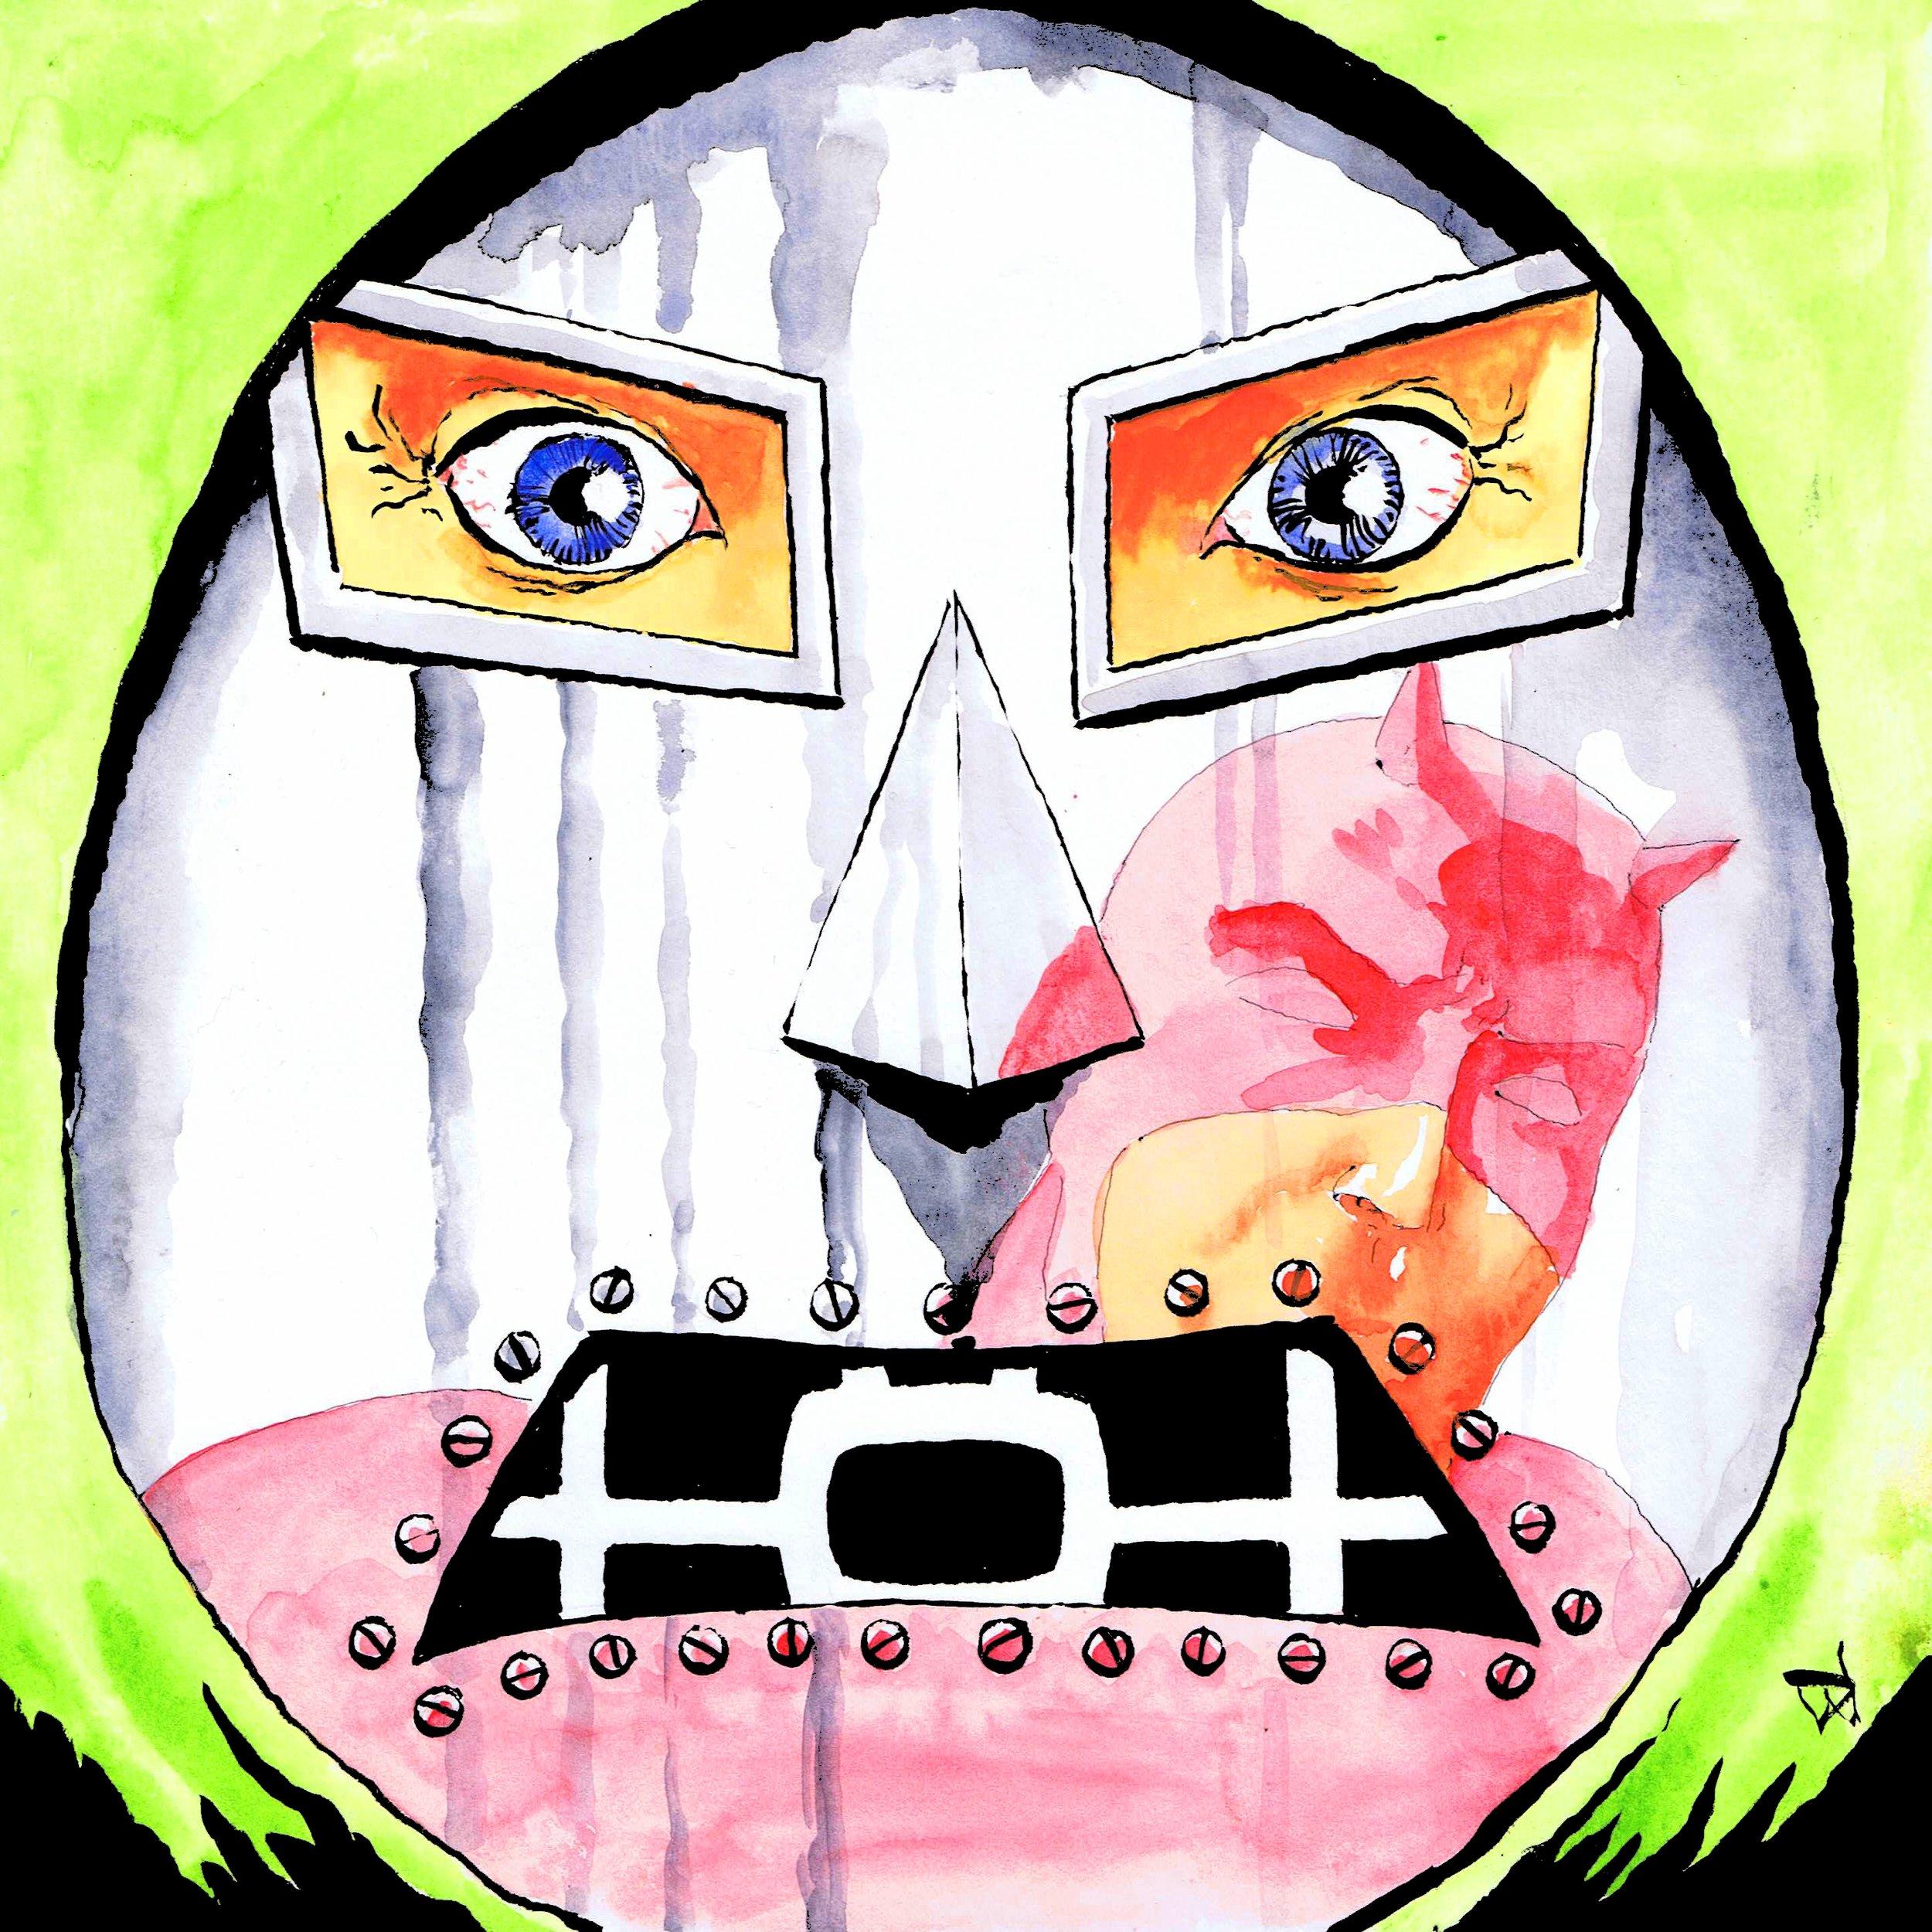 Doom! Art by David Wynne